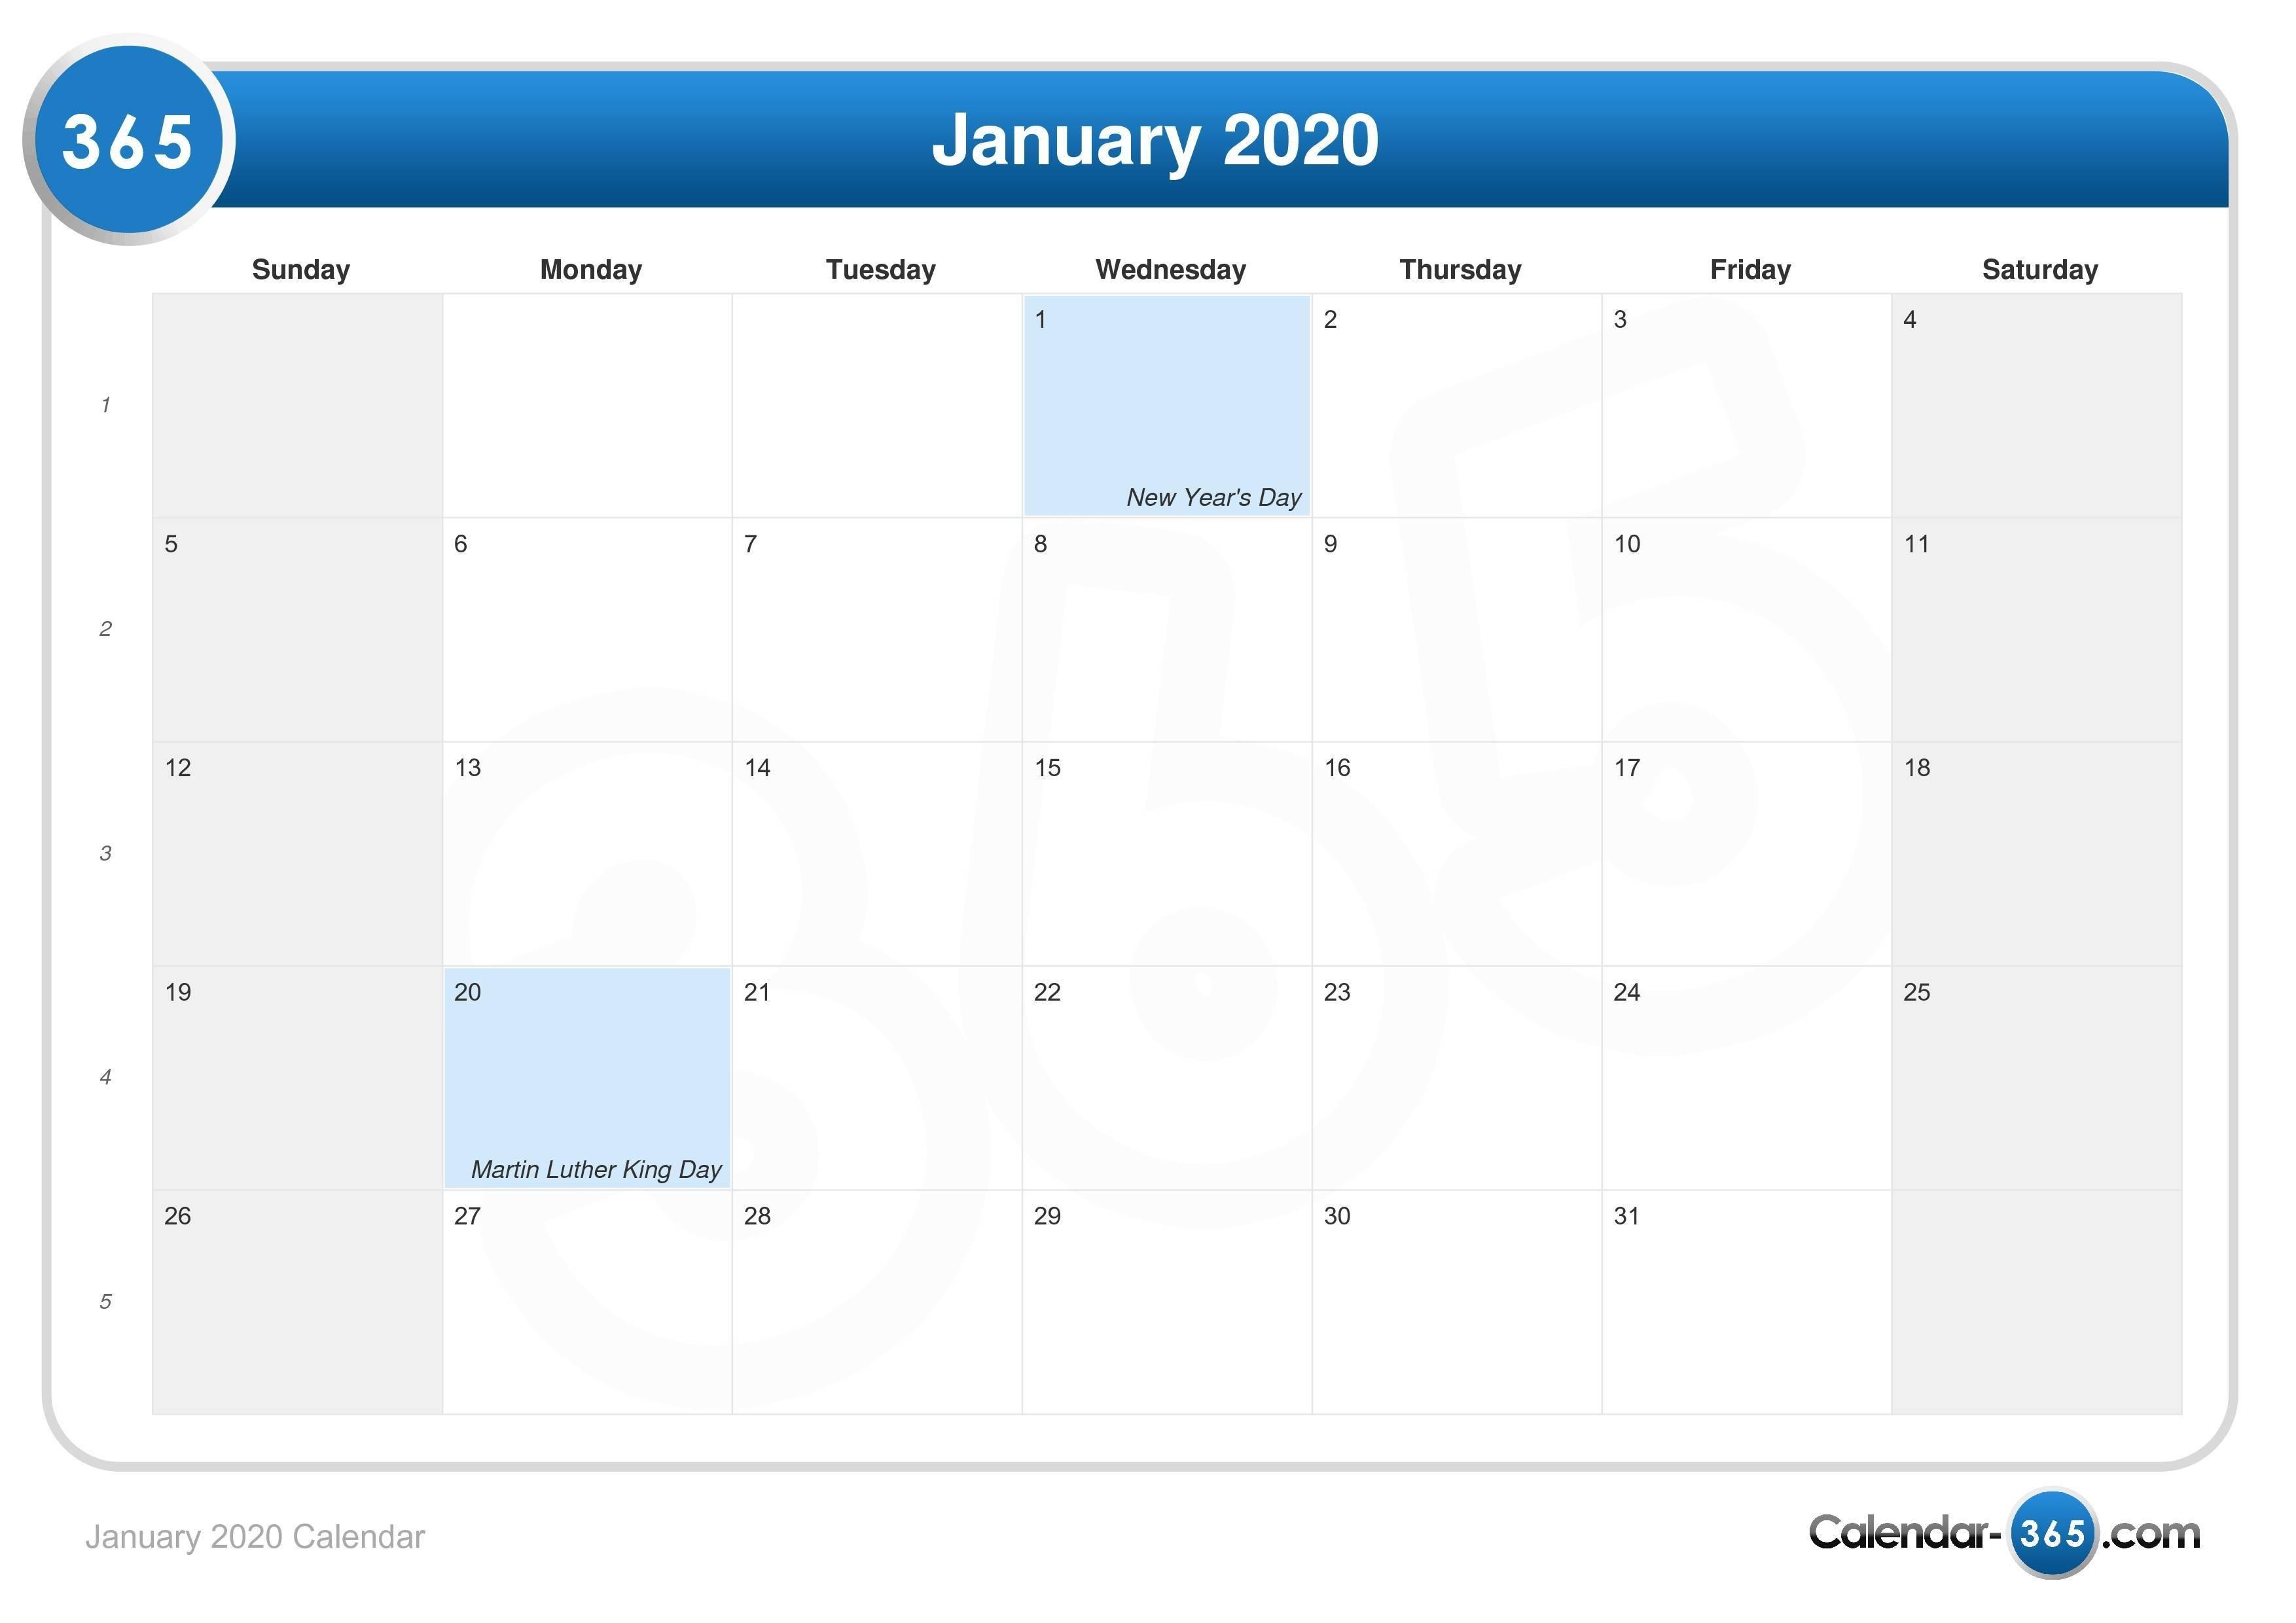 January 2020 Calendar-January 2020 Lunar Calendar